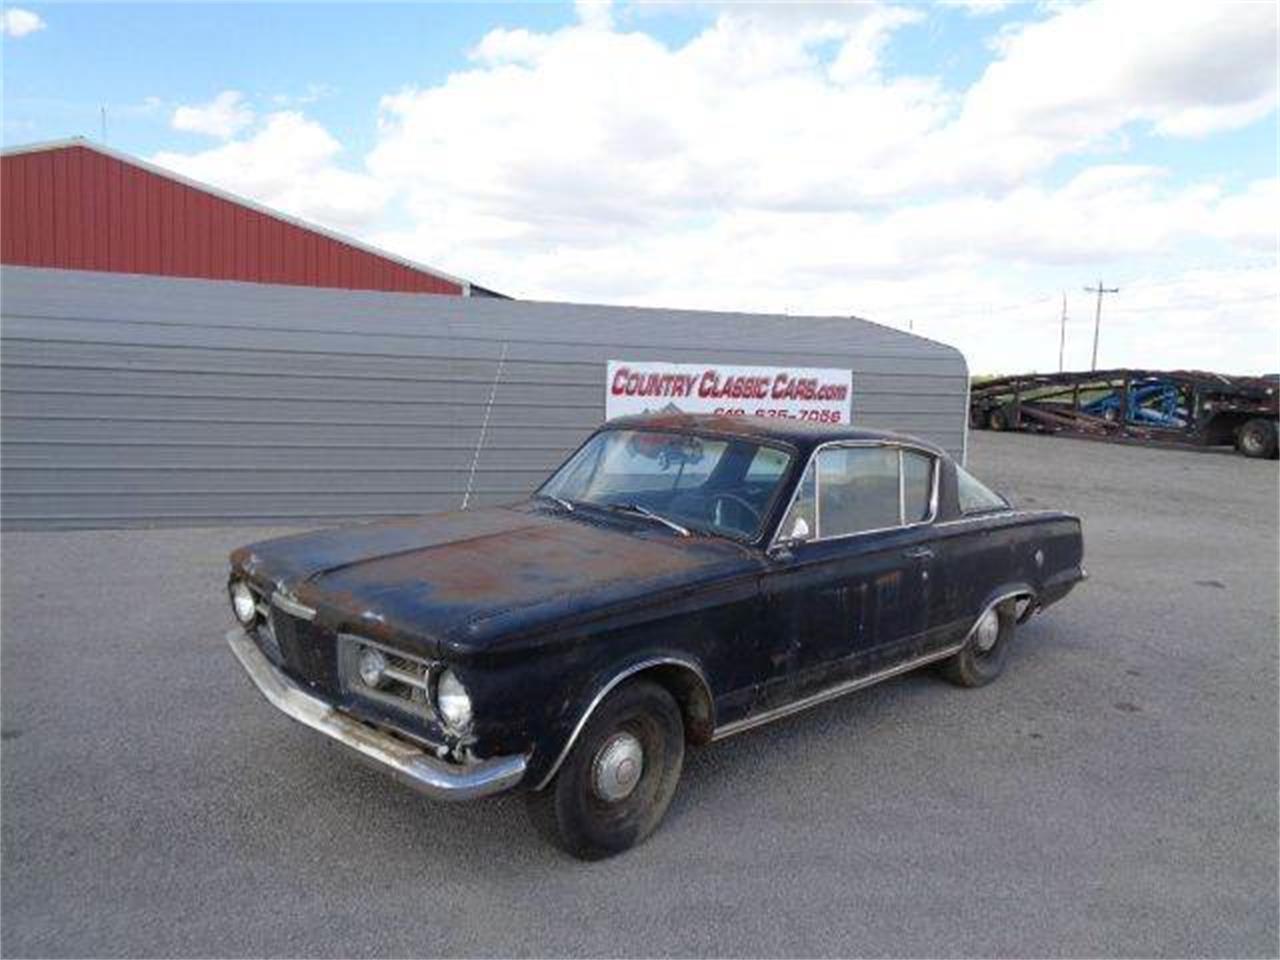 For Sale: 1964 Plymouth Barracuda in Staunton, Illinois